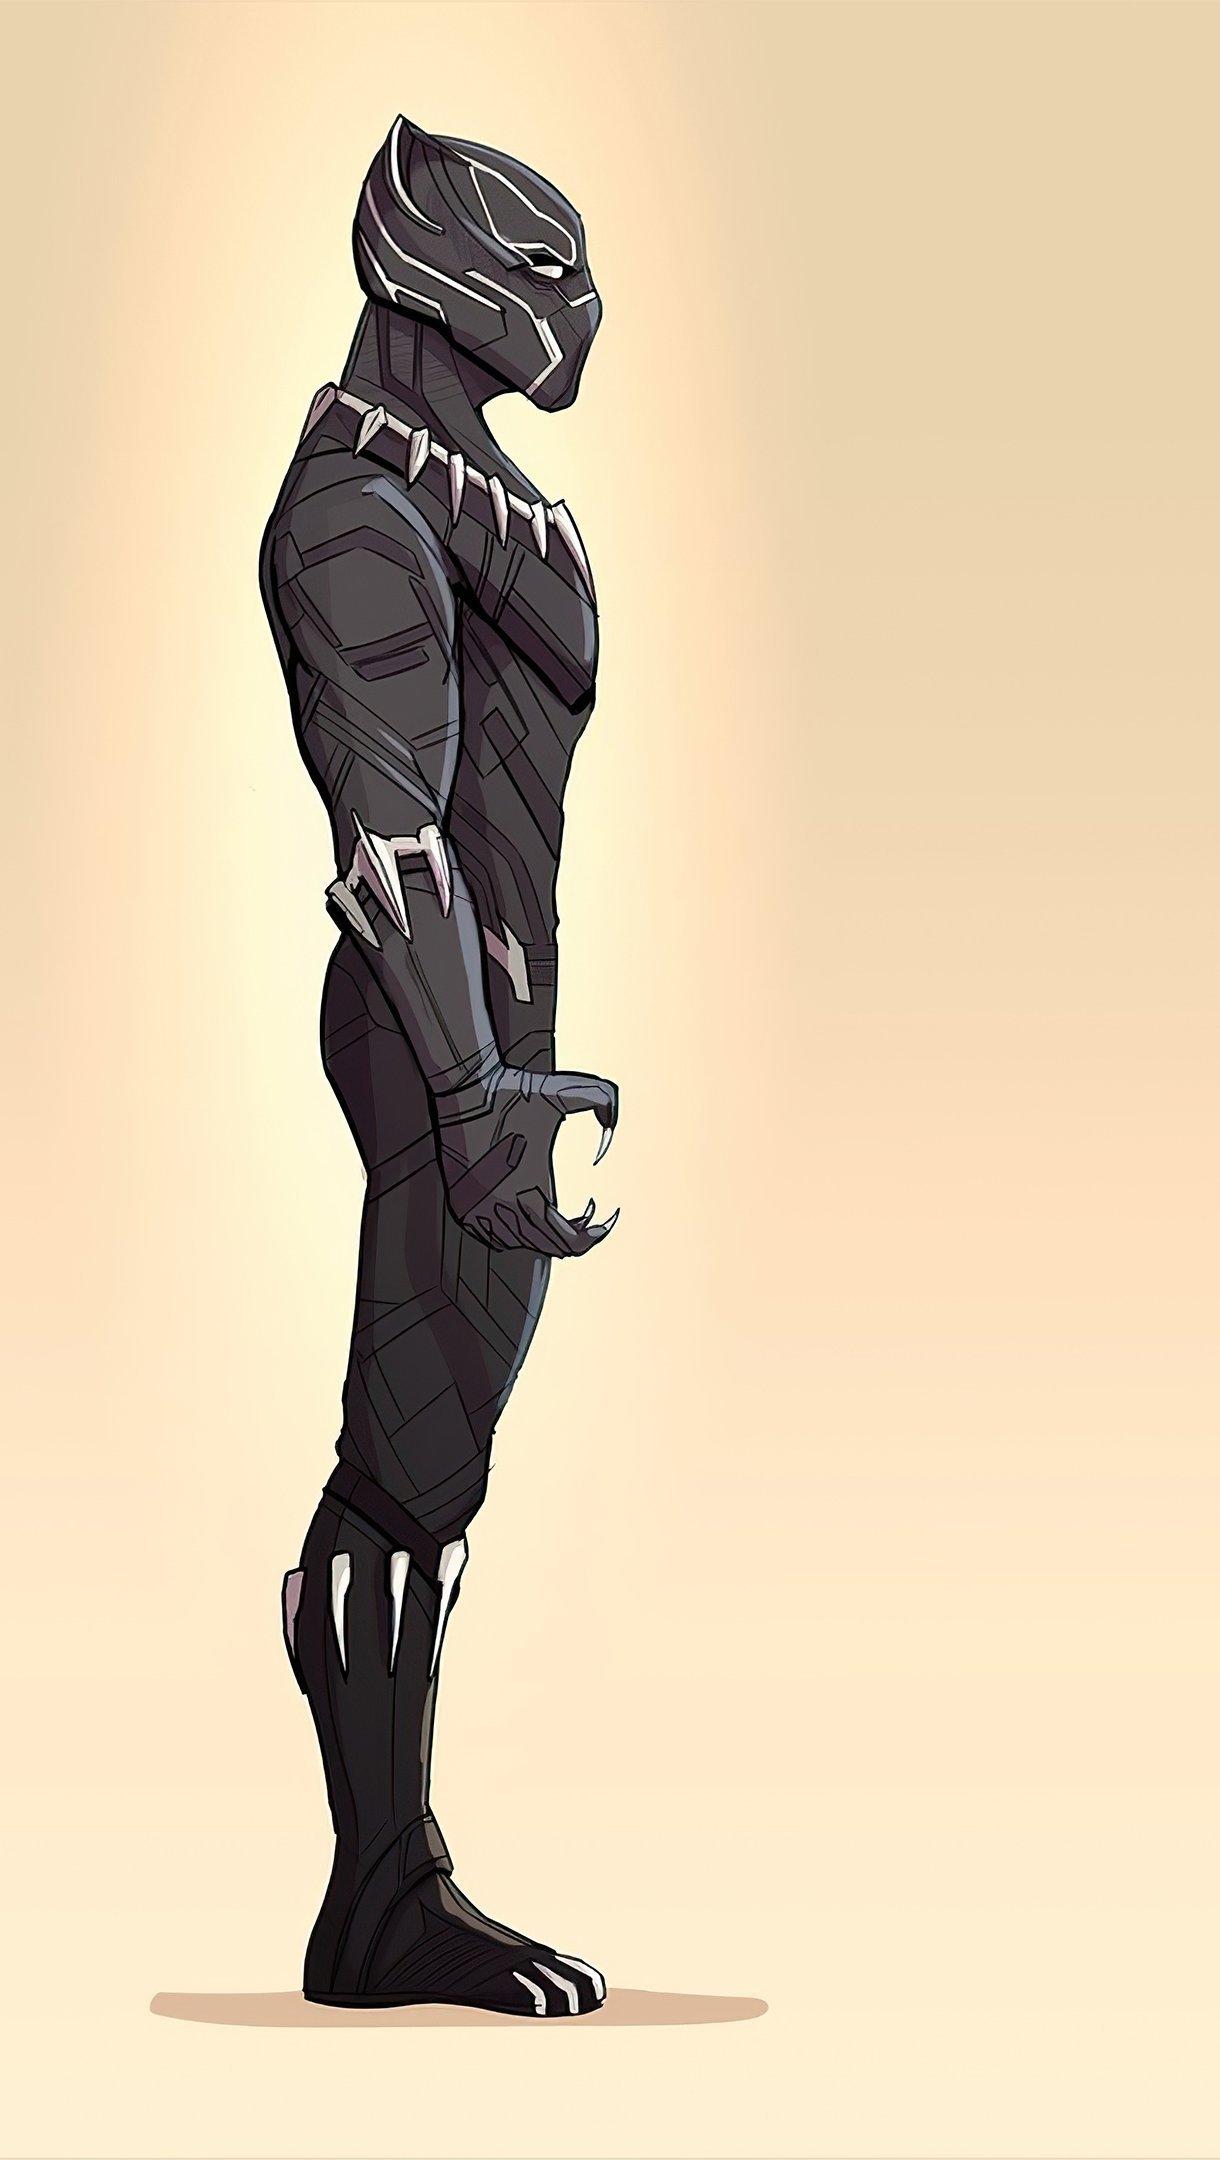 Wallpaper Minimalist Illustration of Black Panther Vertical